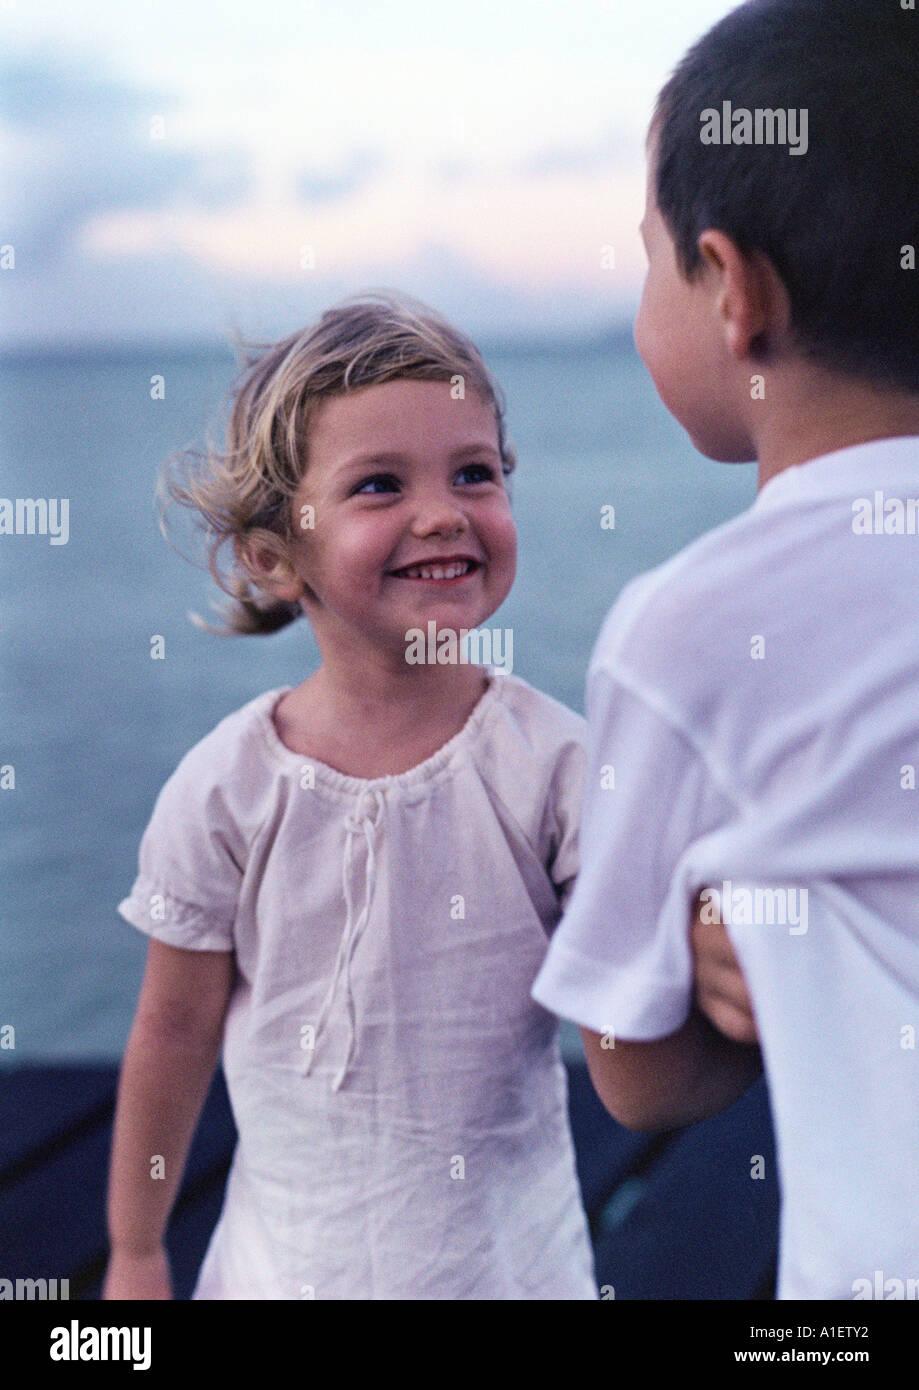 Girl smiling at boy near sea - Stock Image